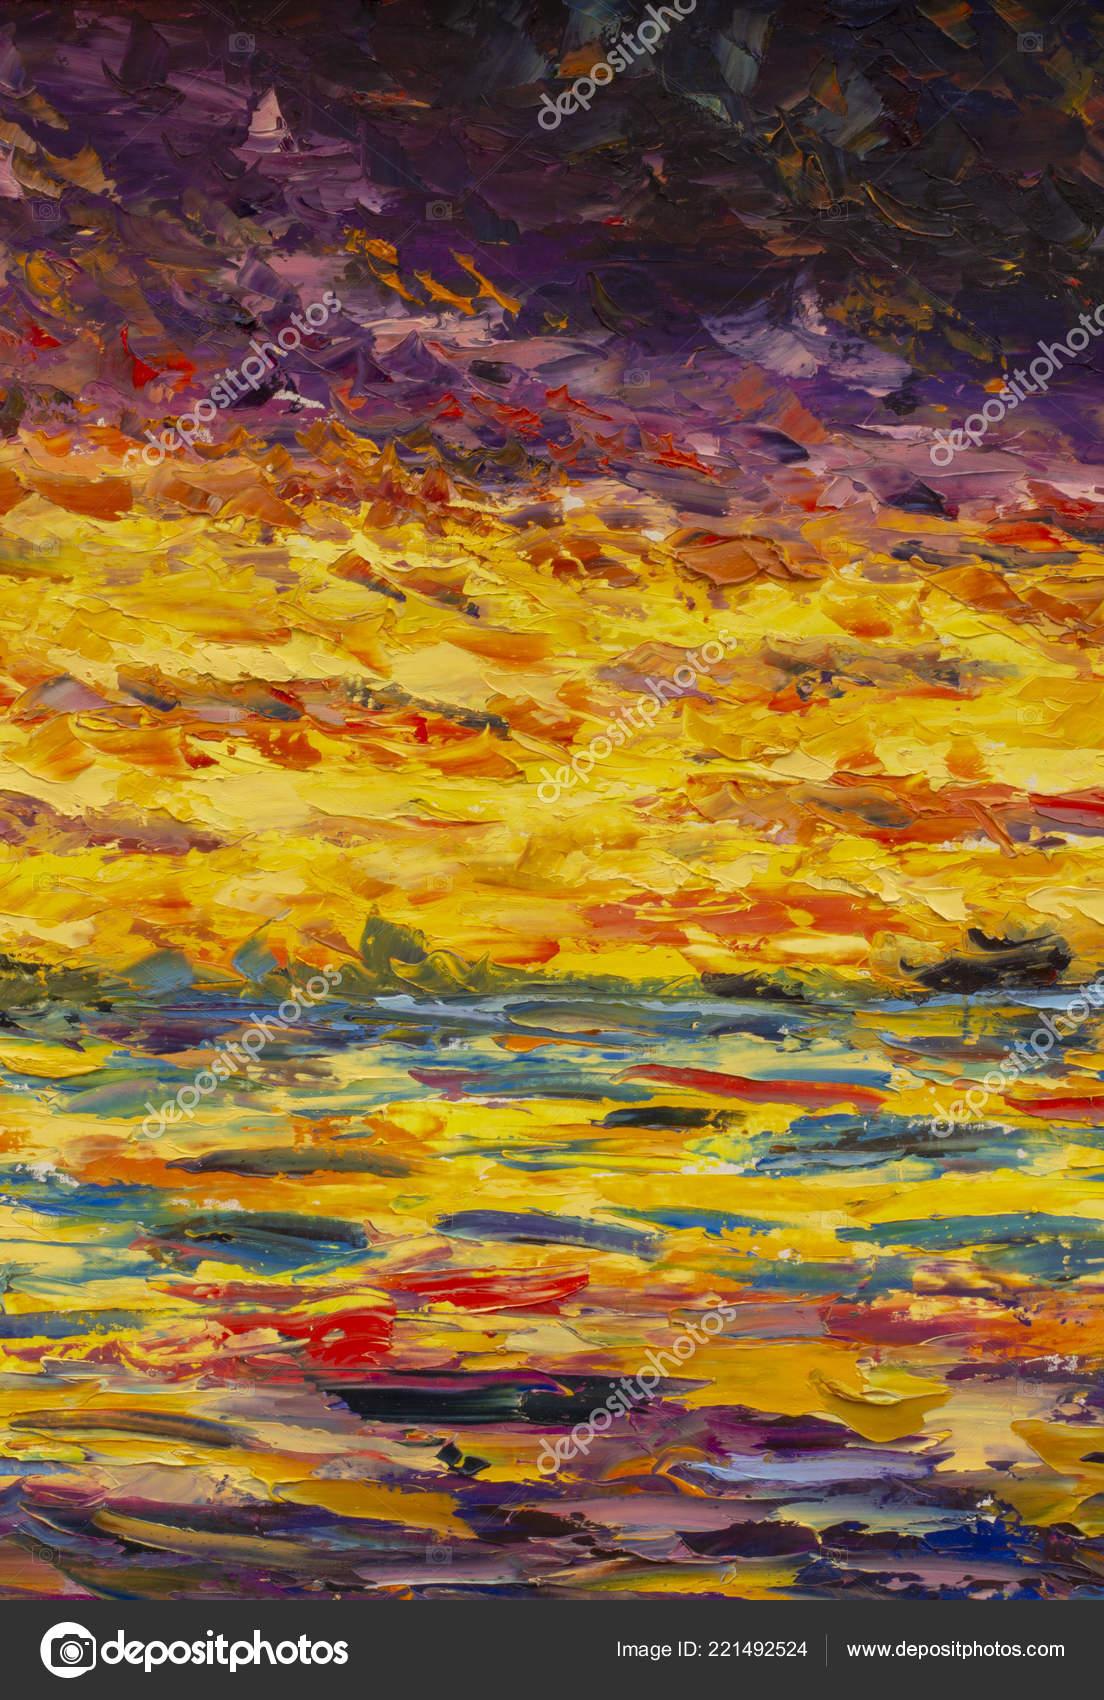 Illustration Peinture Abstraite Rouge Orange Jaune Fragment